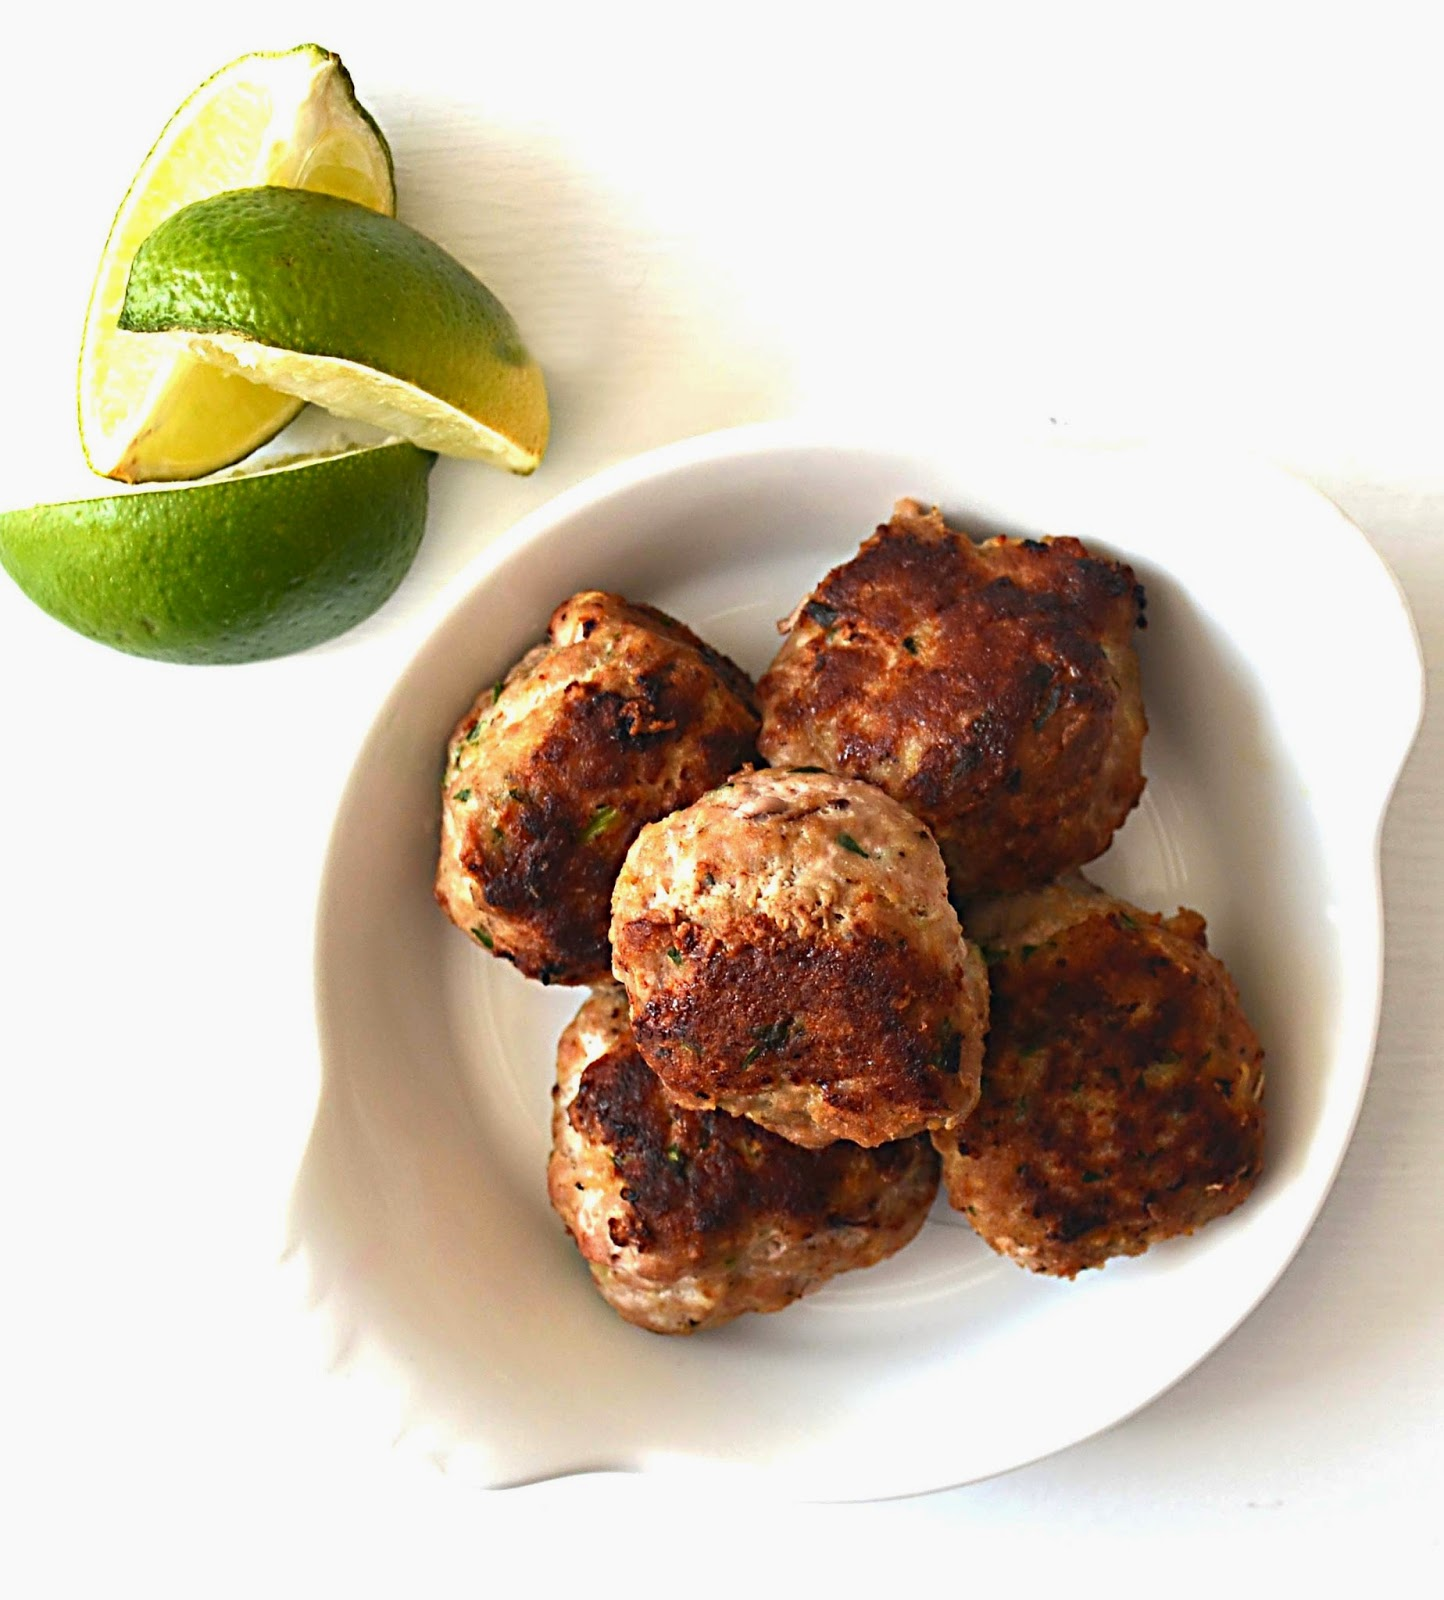 Sew French: Greek Turkey Meatballs